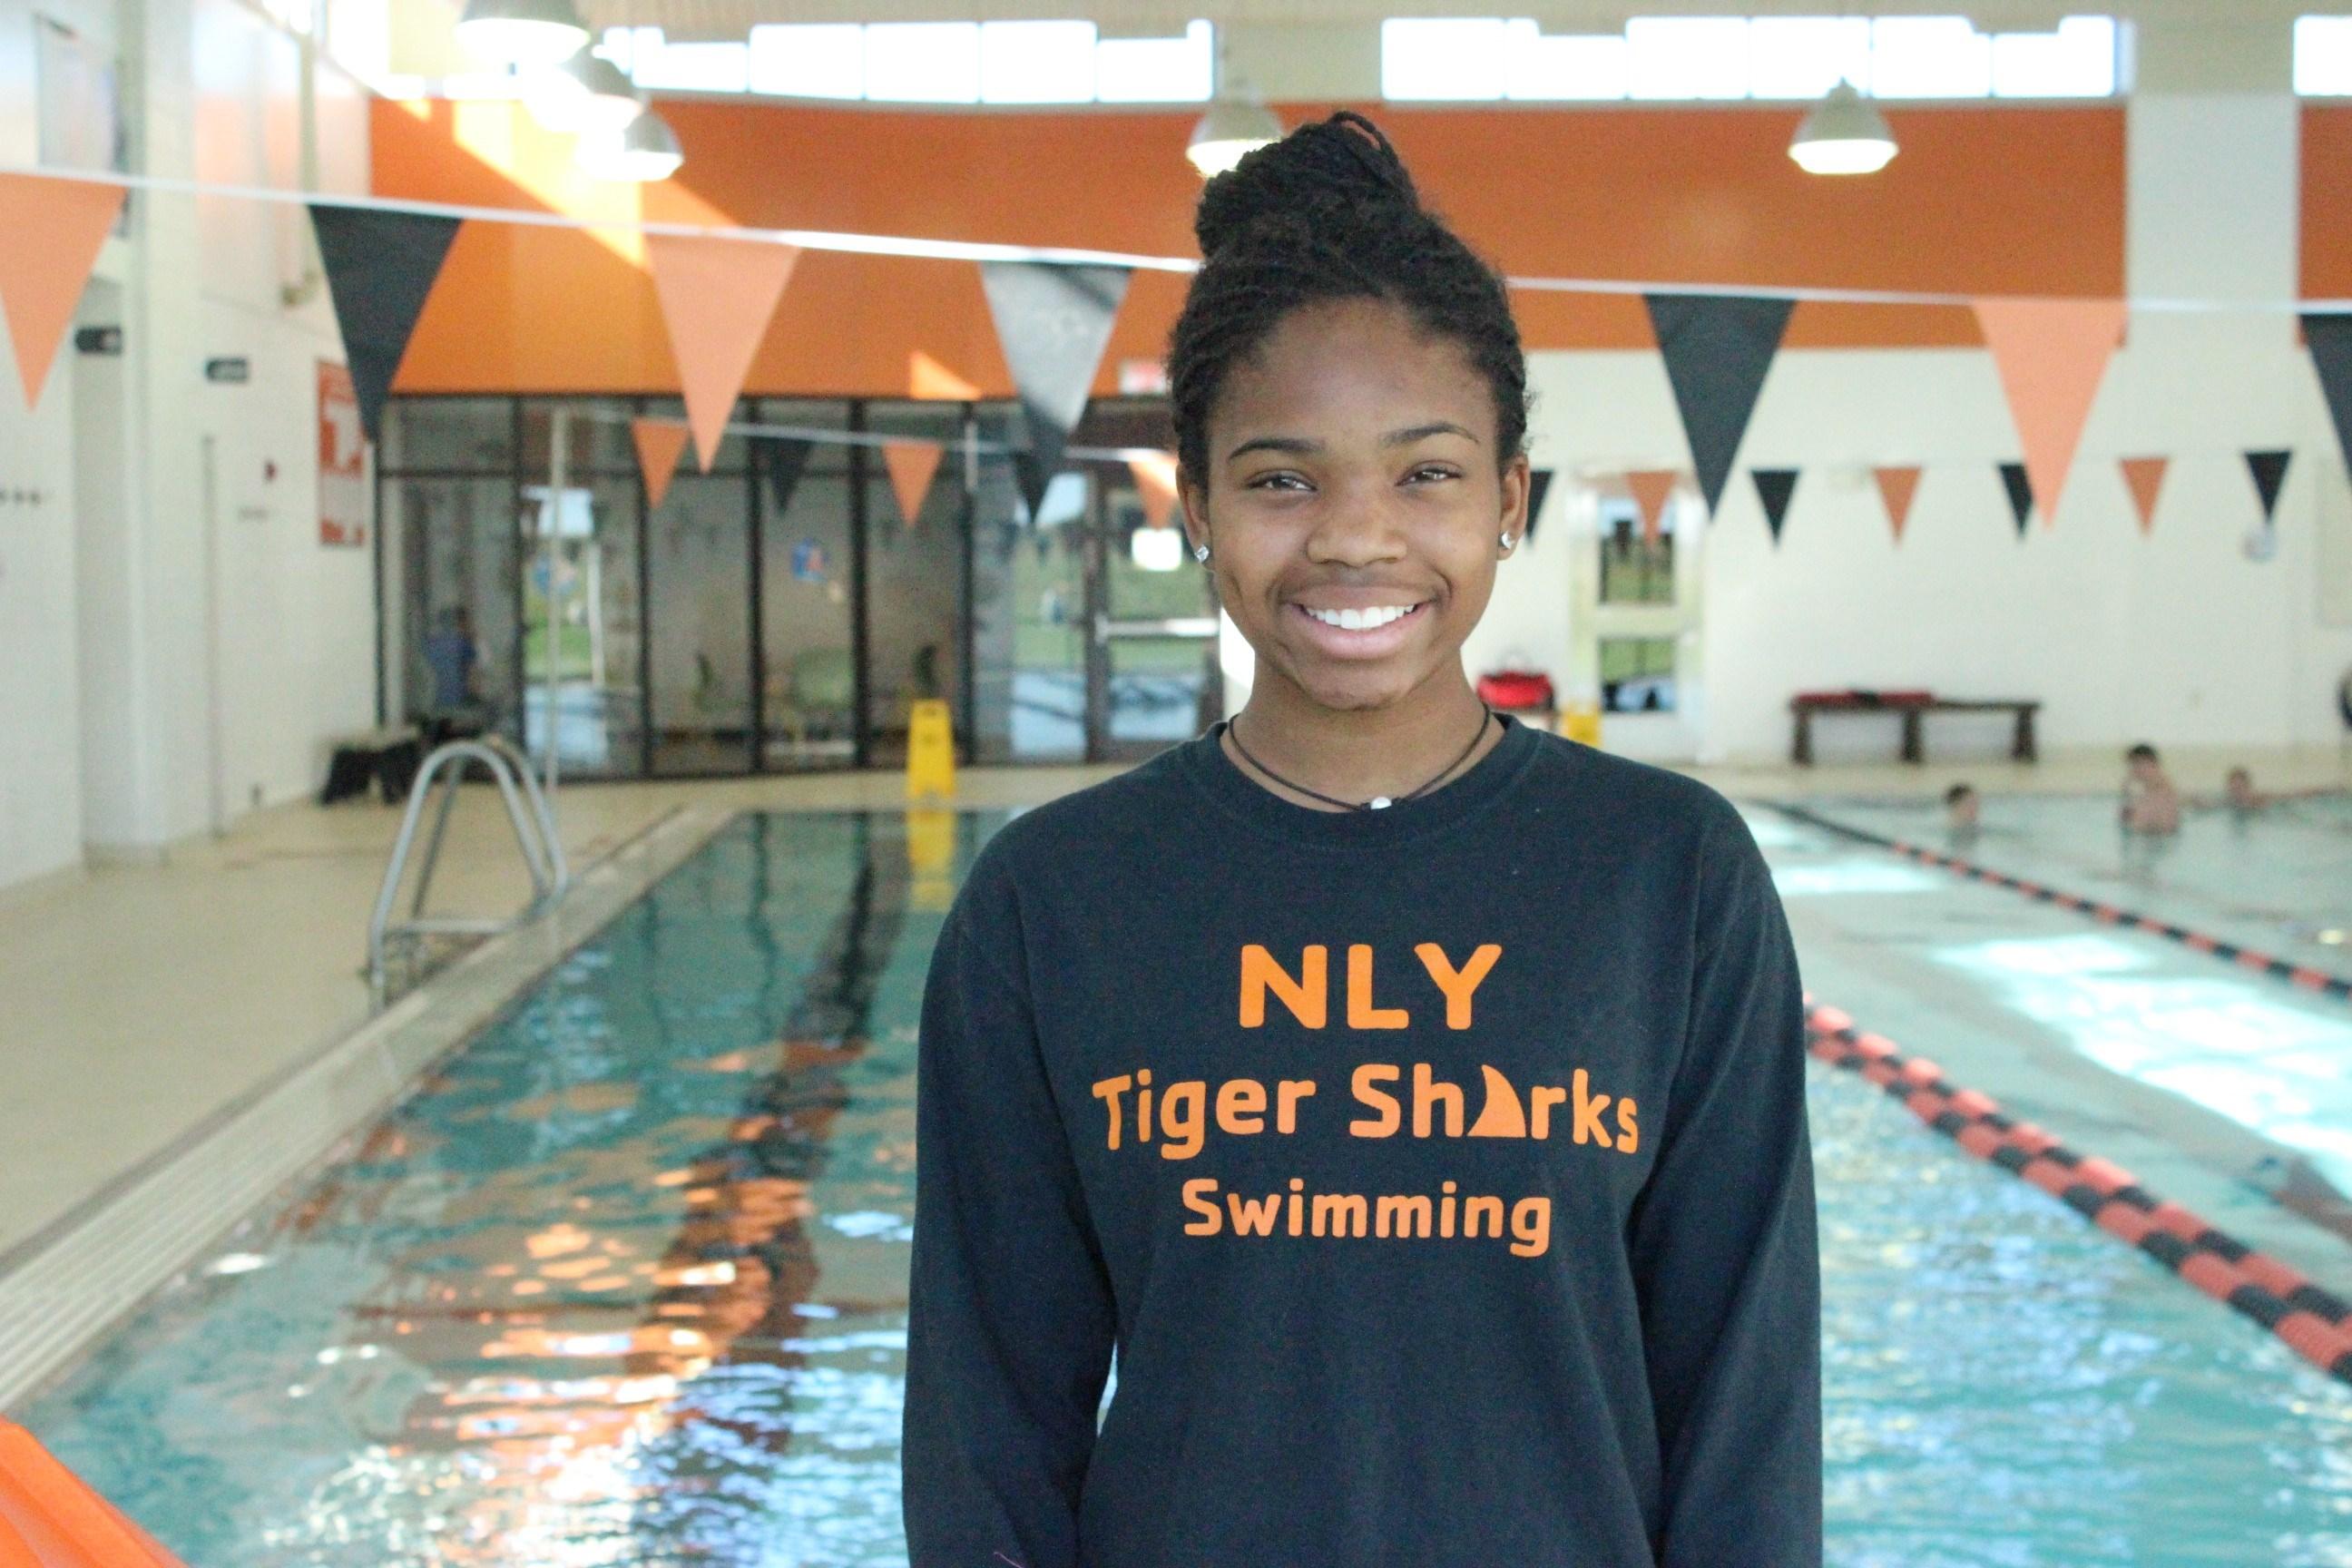 Champions of Change - Amina.El.Amin, YMCA Swimmer